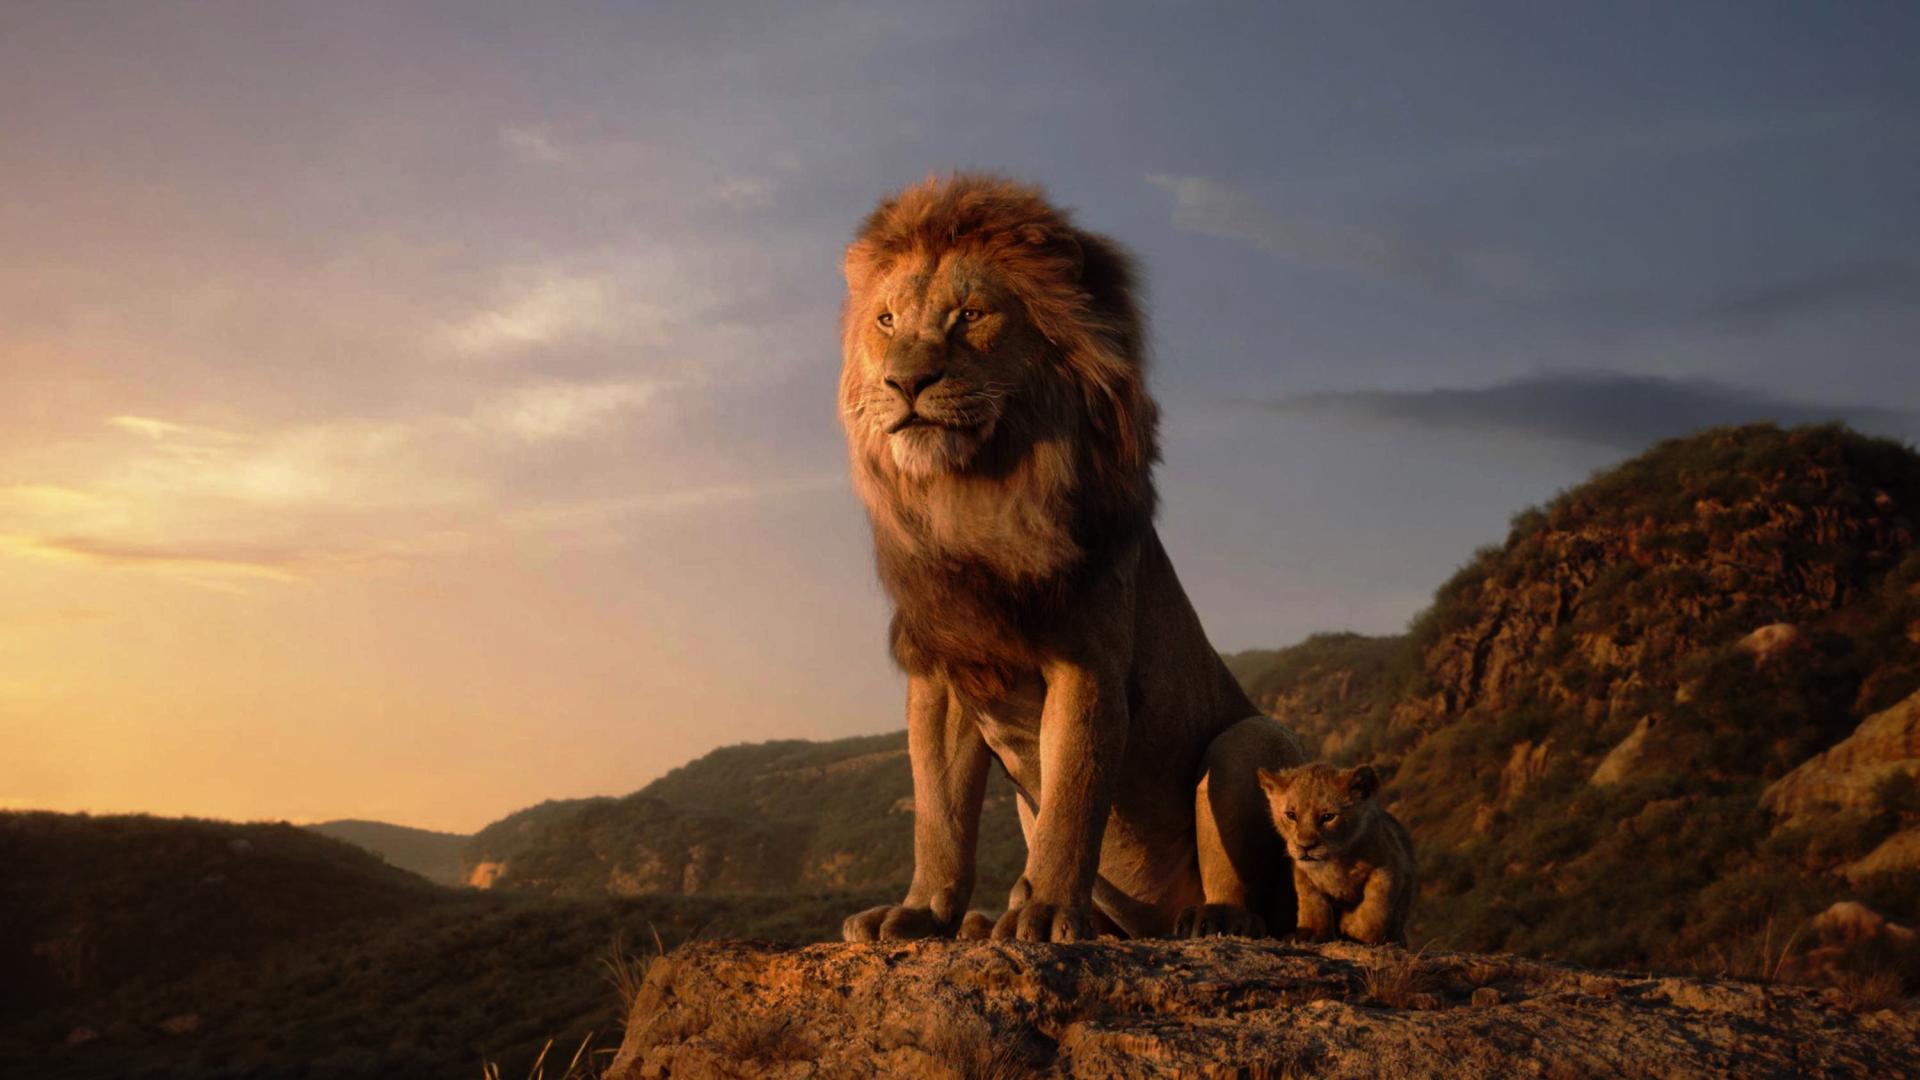 1920x1080 The Lion King 1080p Laptop Full Hd Wallpaper Hd Movies